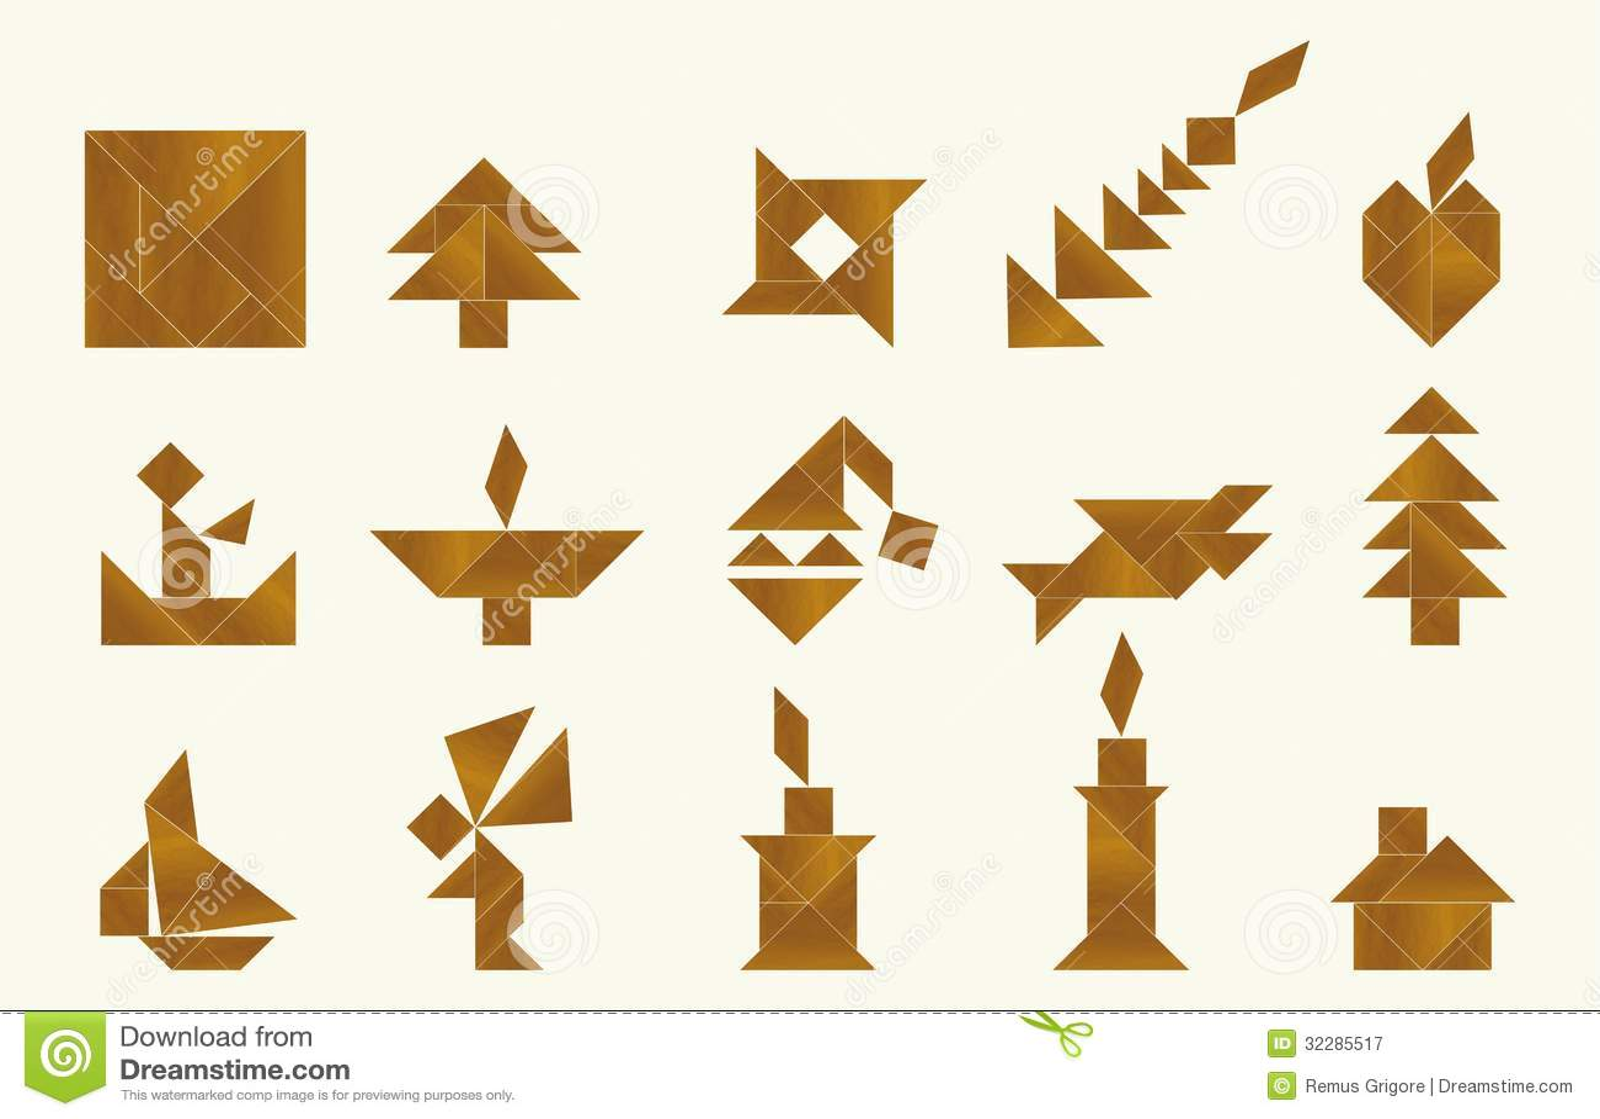 http://thumbs.dreamstime.com/z/tangram-r%C3%B3%C5%BCnorodny-32285517.jpg